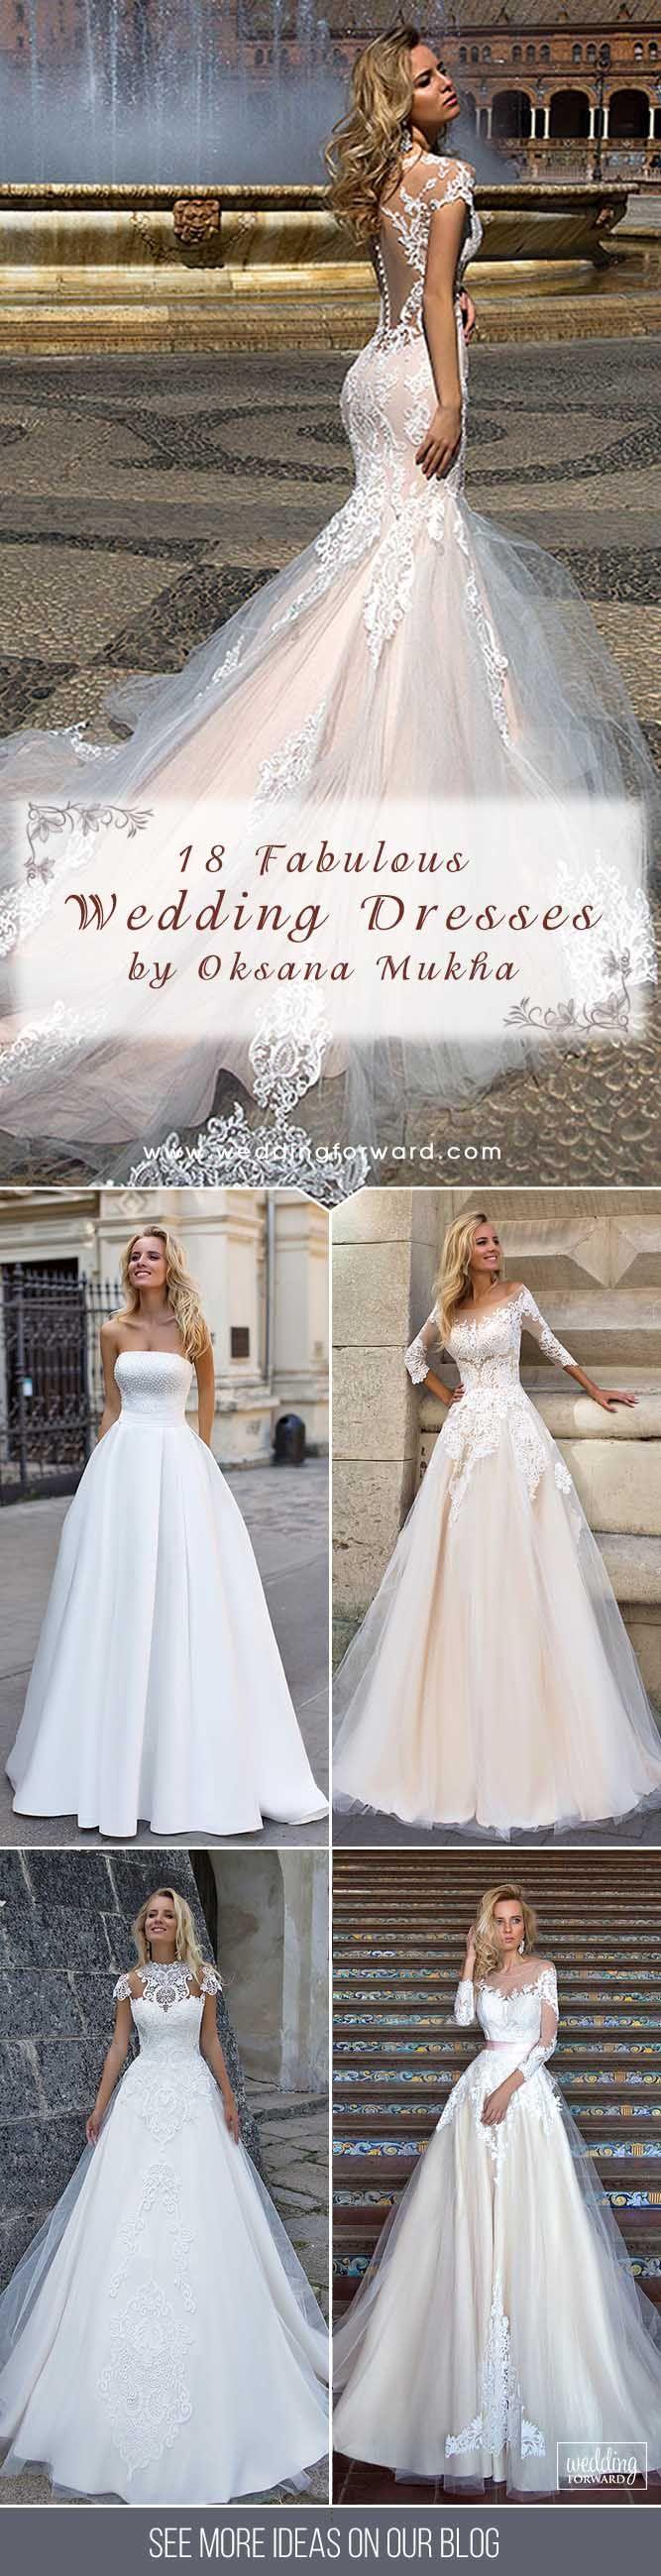 Ronald joyce lace wedding dress september 2018  best Dream Wedding images on Pinterest  Weddings Boho wedding